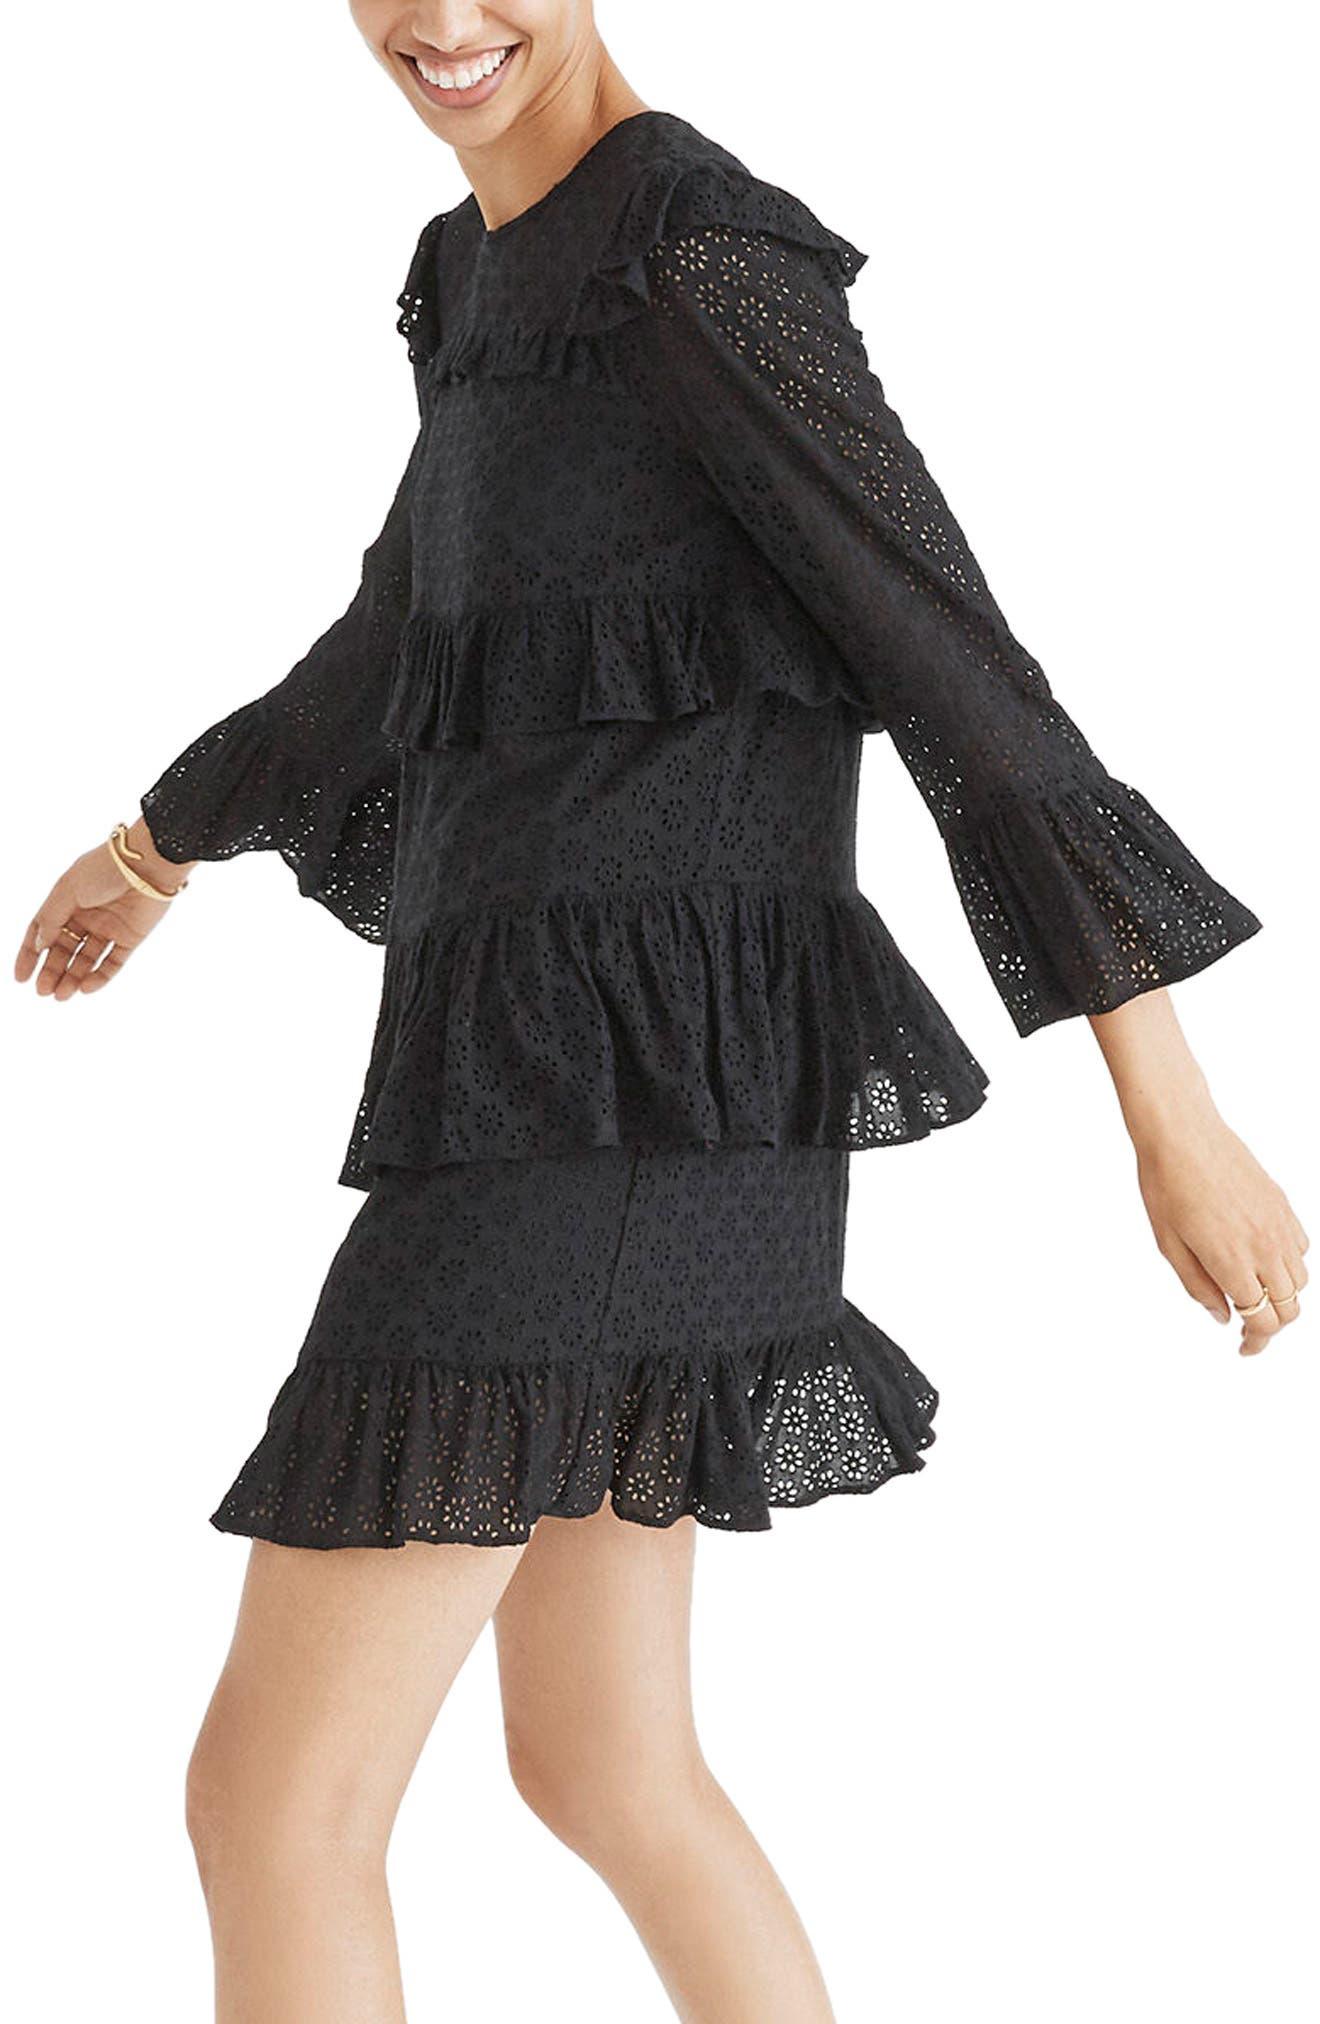 Alternate Image 1 Selected - Madewell Waterlily Ruffle Eyelet Dress